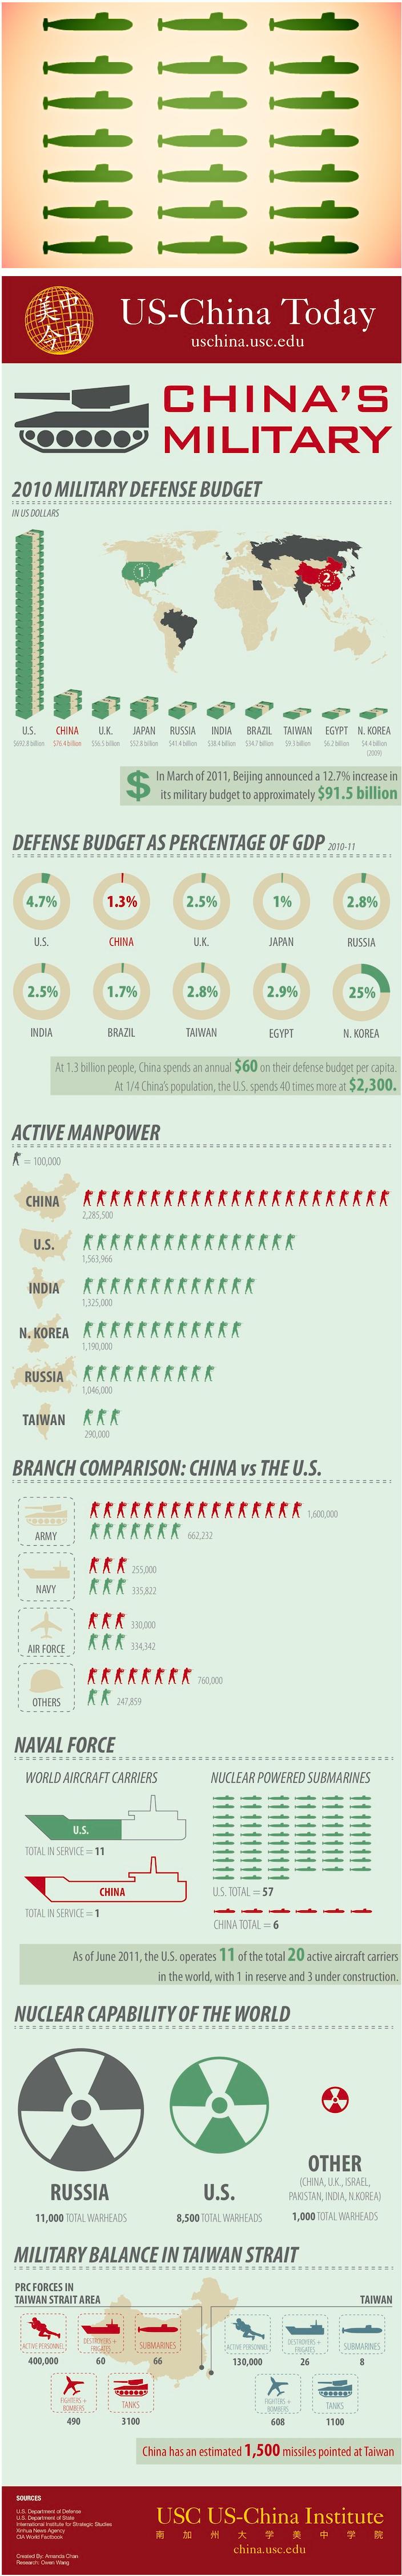 US-China Today: Infographic: China's Military